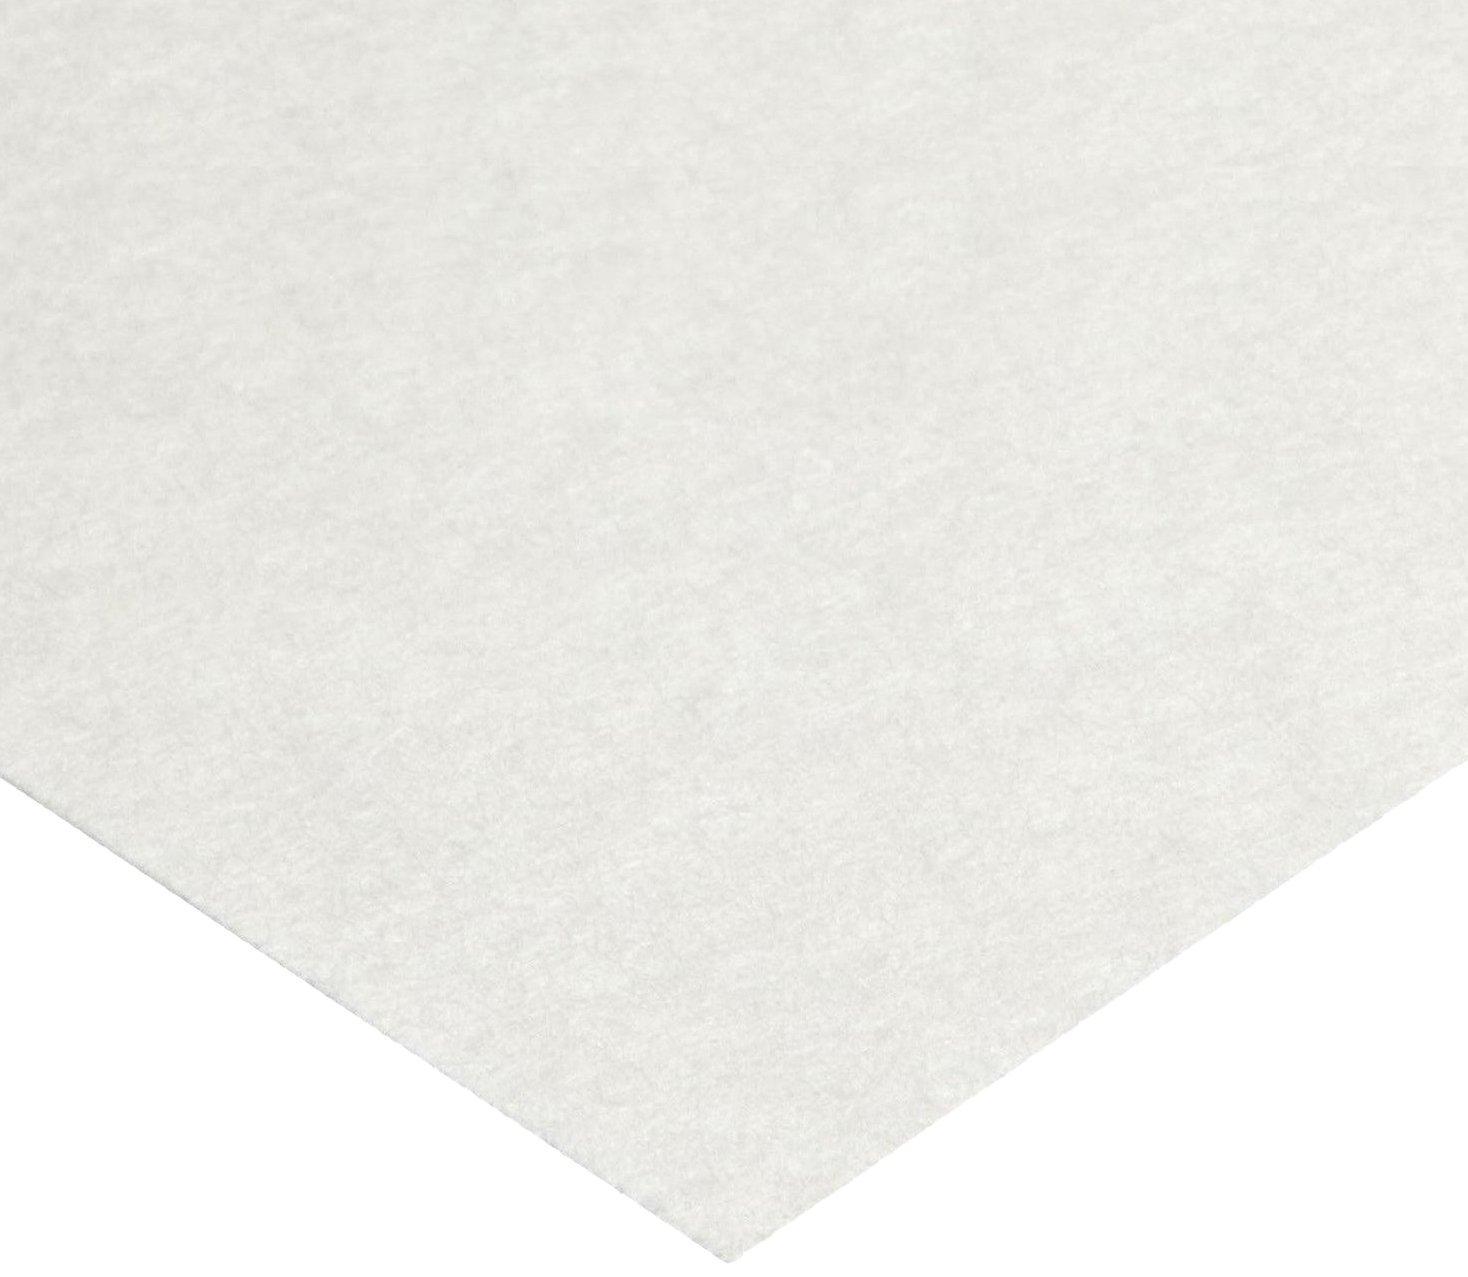 GE Whatman 3030-917 Grade 3MM Chr Cellulose Chromatography Paper Sheet, 46cm Width, 57cm Length (Pack of 100)